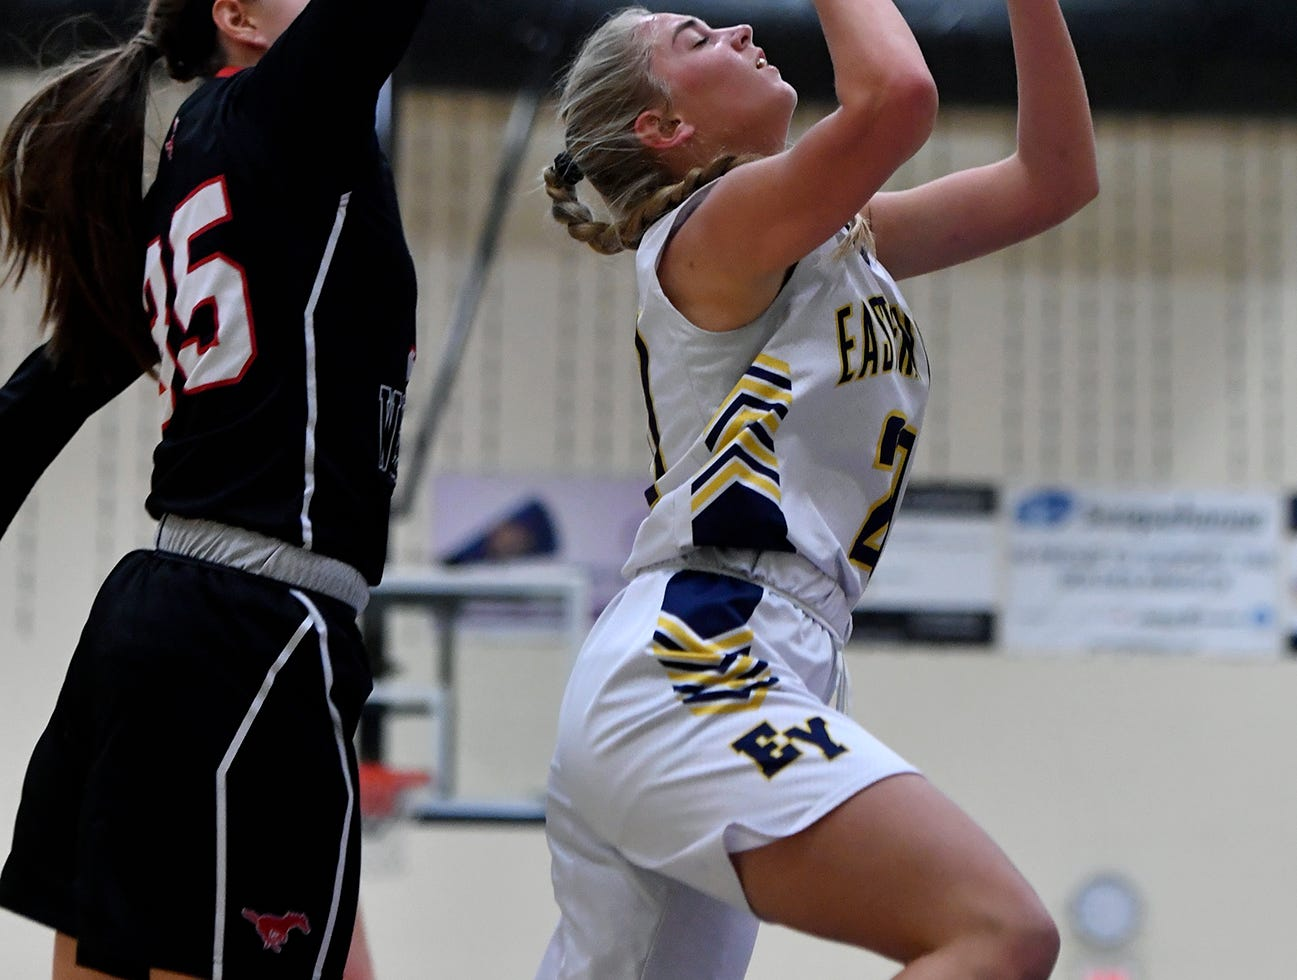 South Western at Eastern York girls' basketball, Monday, January 7, 2019. John A. Pavoncello photo